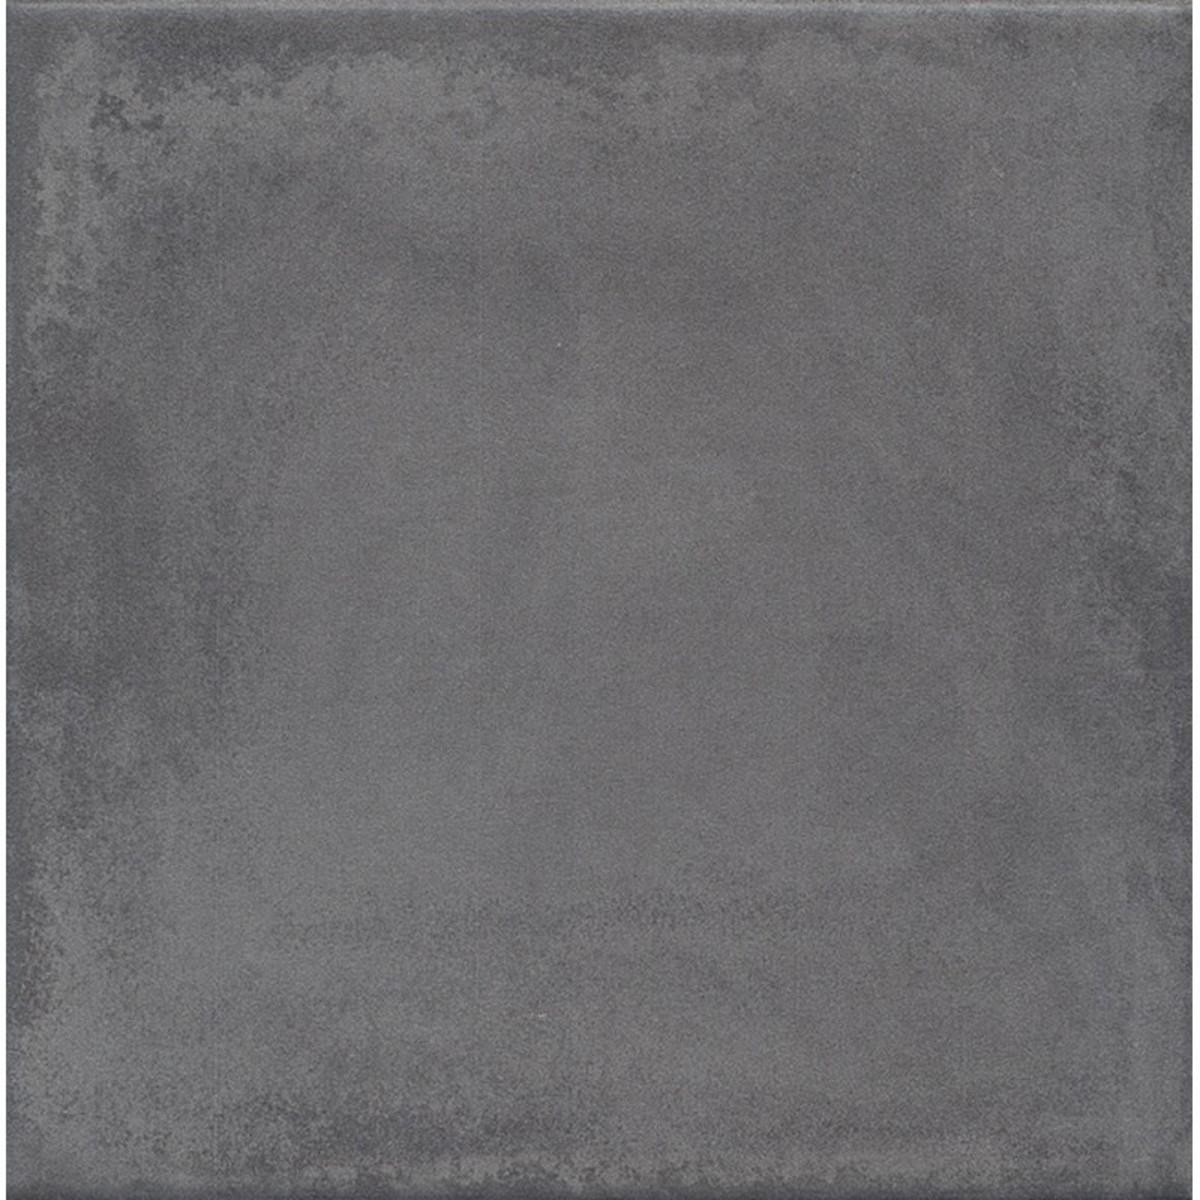 Плитка Напольная Карнаби-Стрит Цвет Темно-Серый 01Х201 105 М2